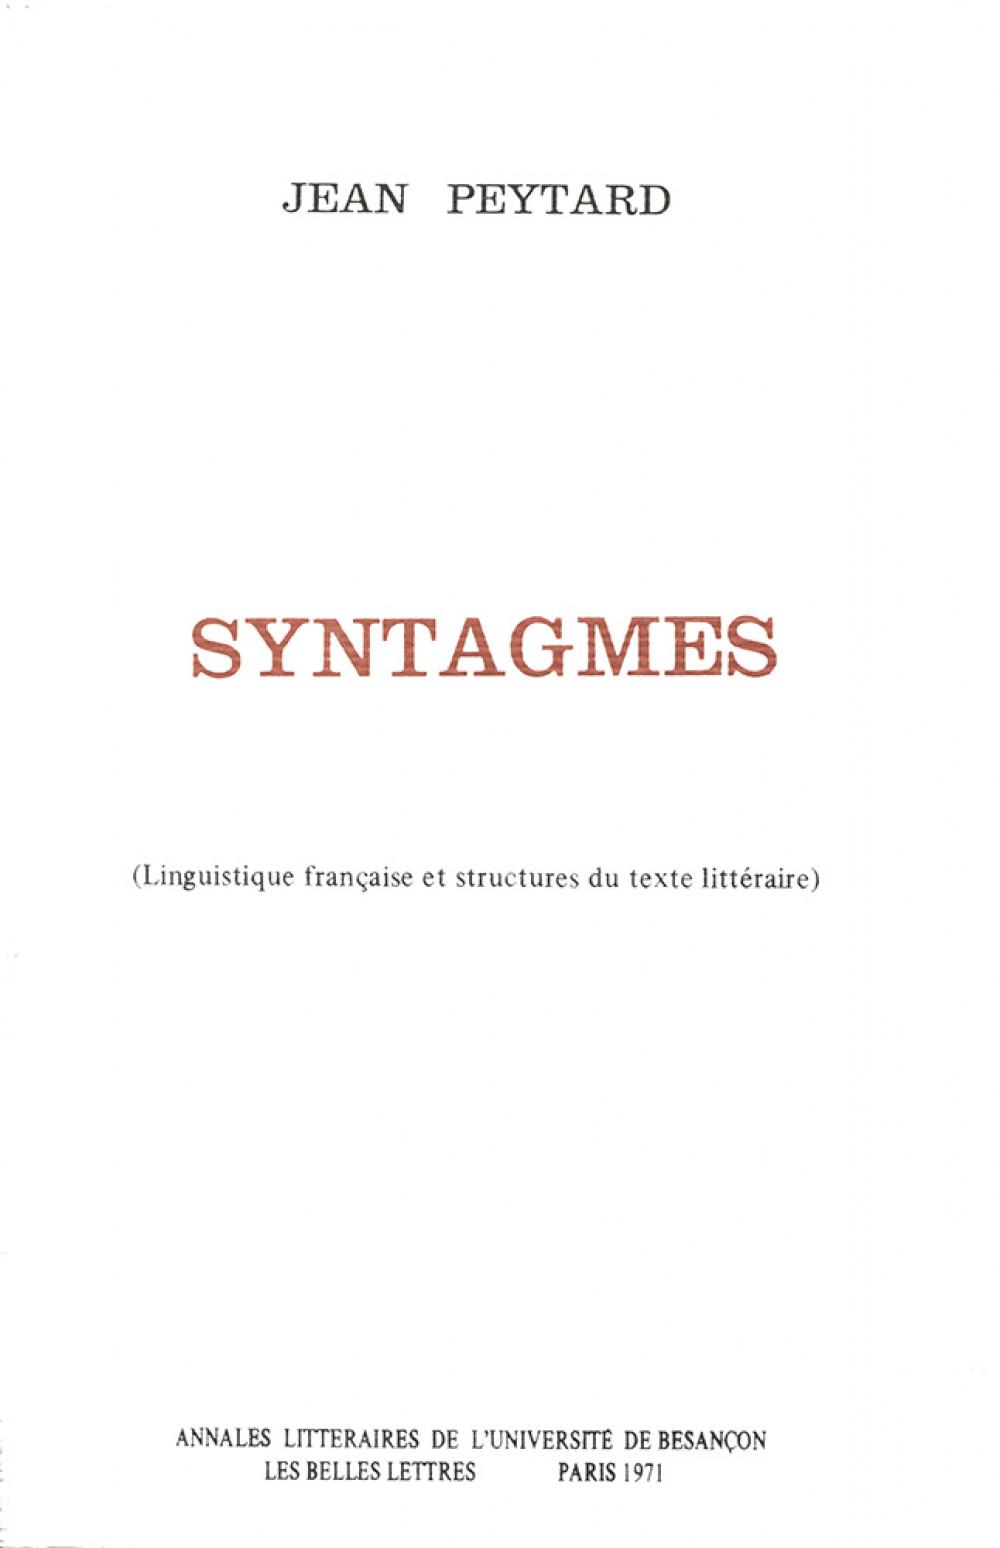 Syntagmes 1